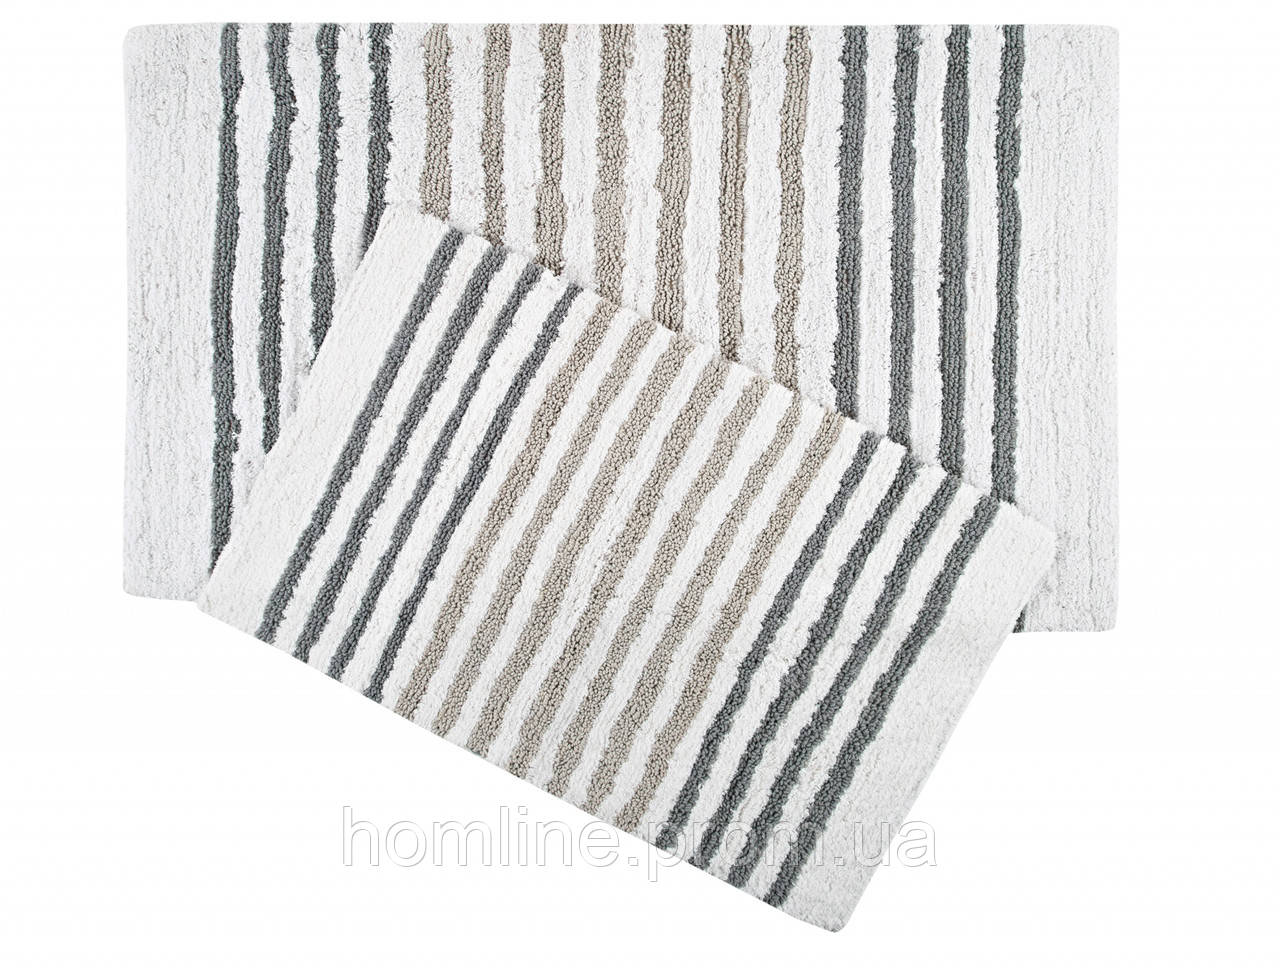 Набор ковриков Irya Grenada gri серый 70*115+55*80